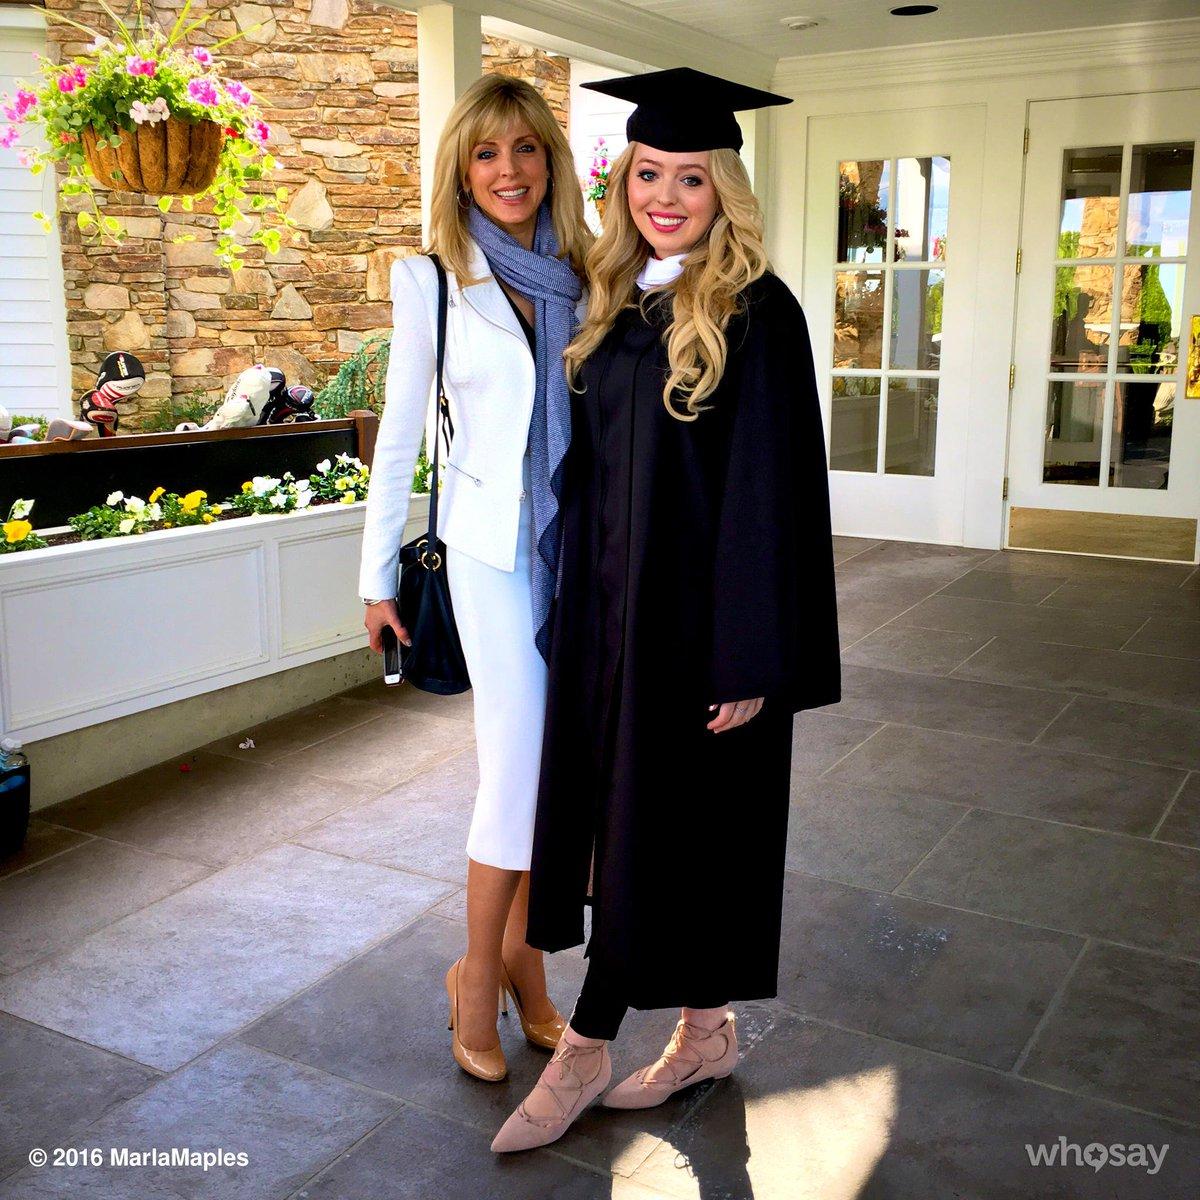 Pre #graduation2016 w/my beautiful, smart, dedicated to be her very best girl! I love u so @TiffanyATrump https://t.co/WcGeyXyuvH